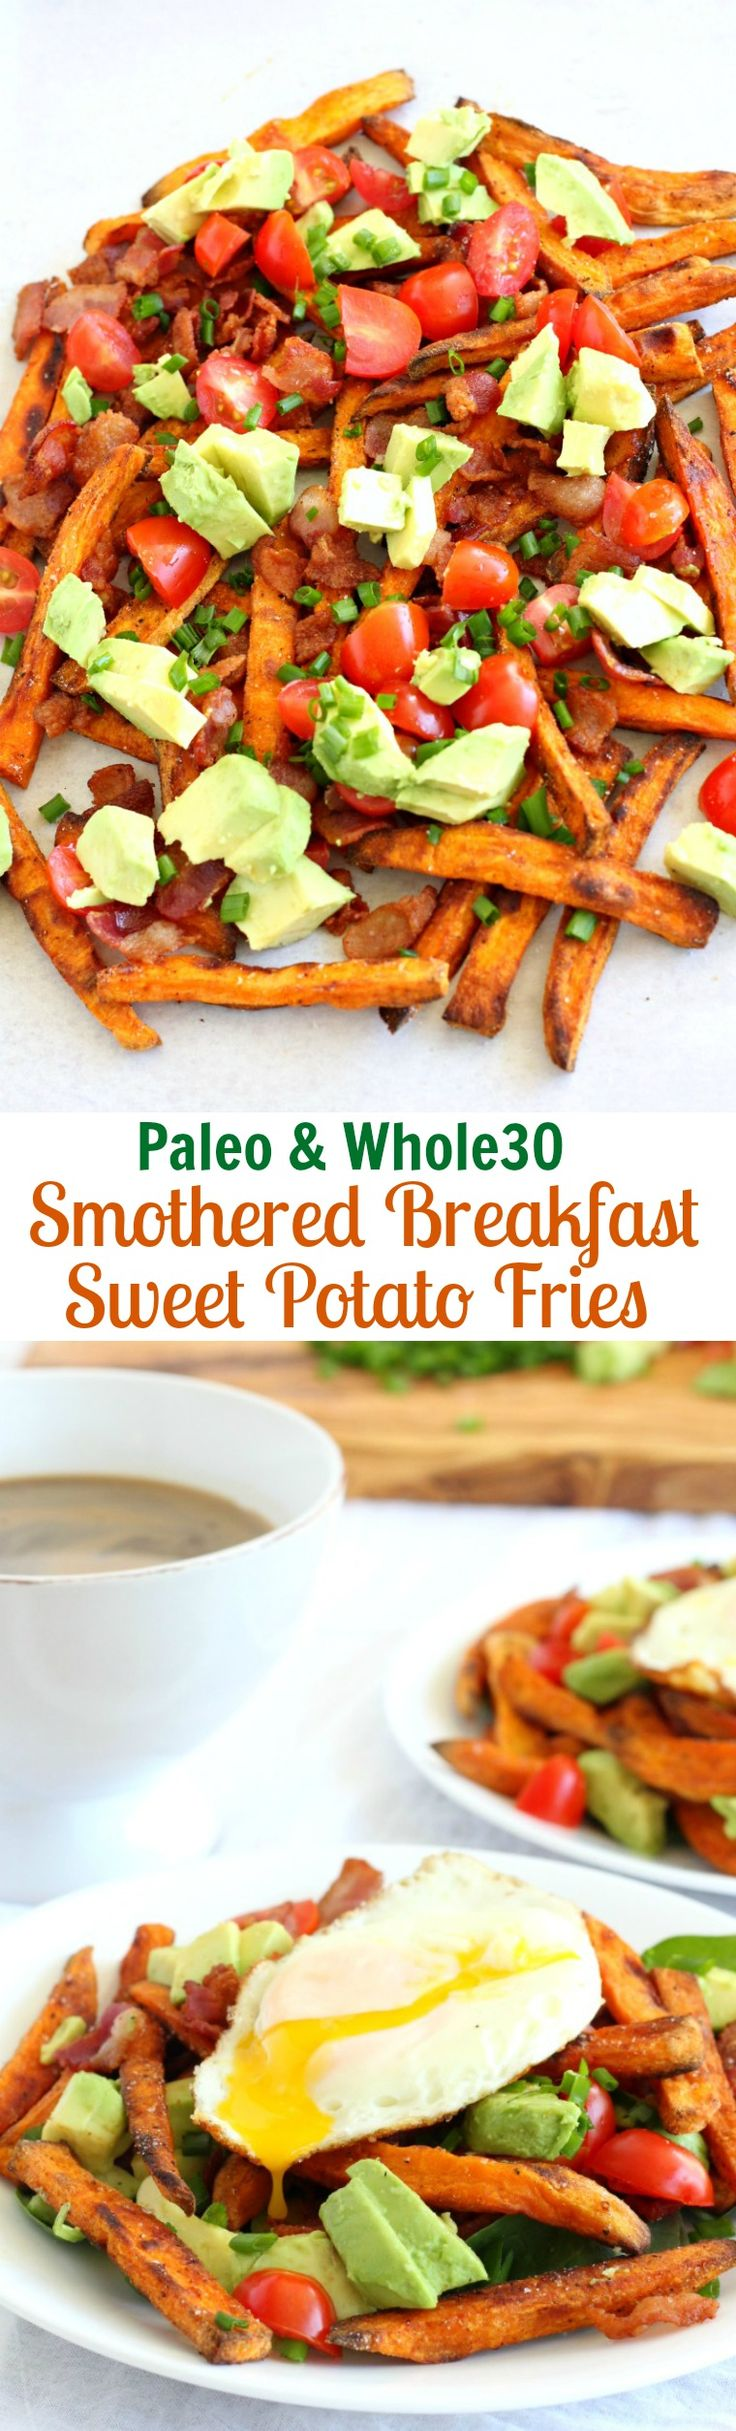 Smothered Breakfast Sweet Potato Fries – Paleo and Whole30 friendly! Crispy baked sweet potato fries a